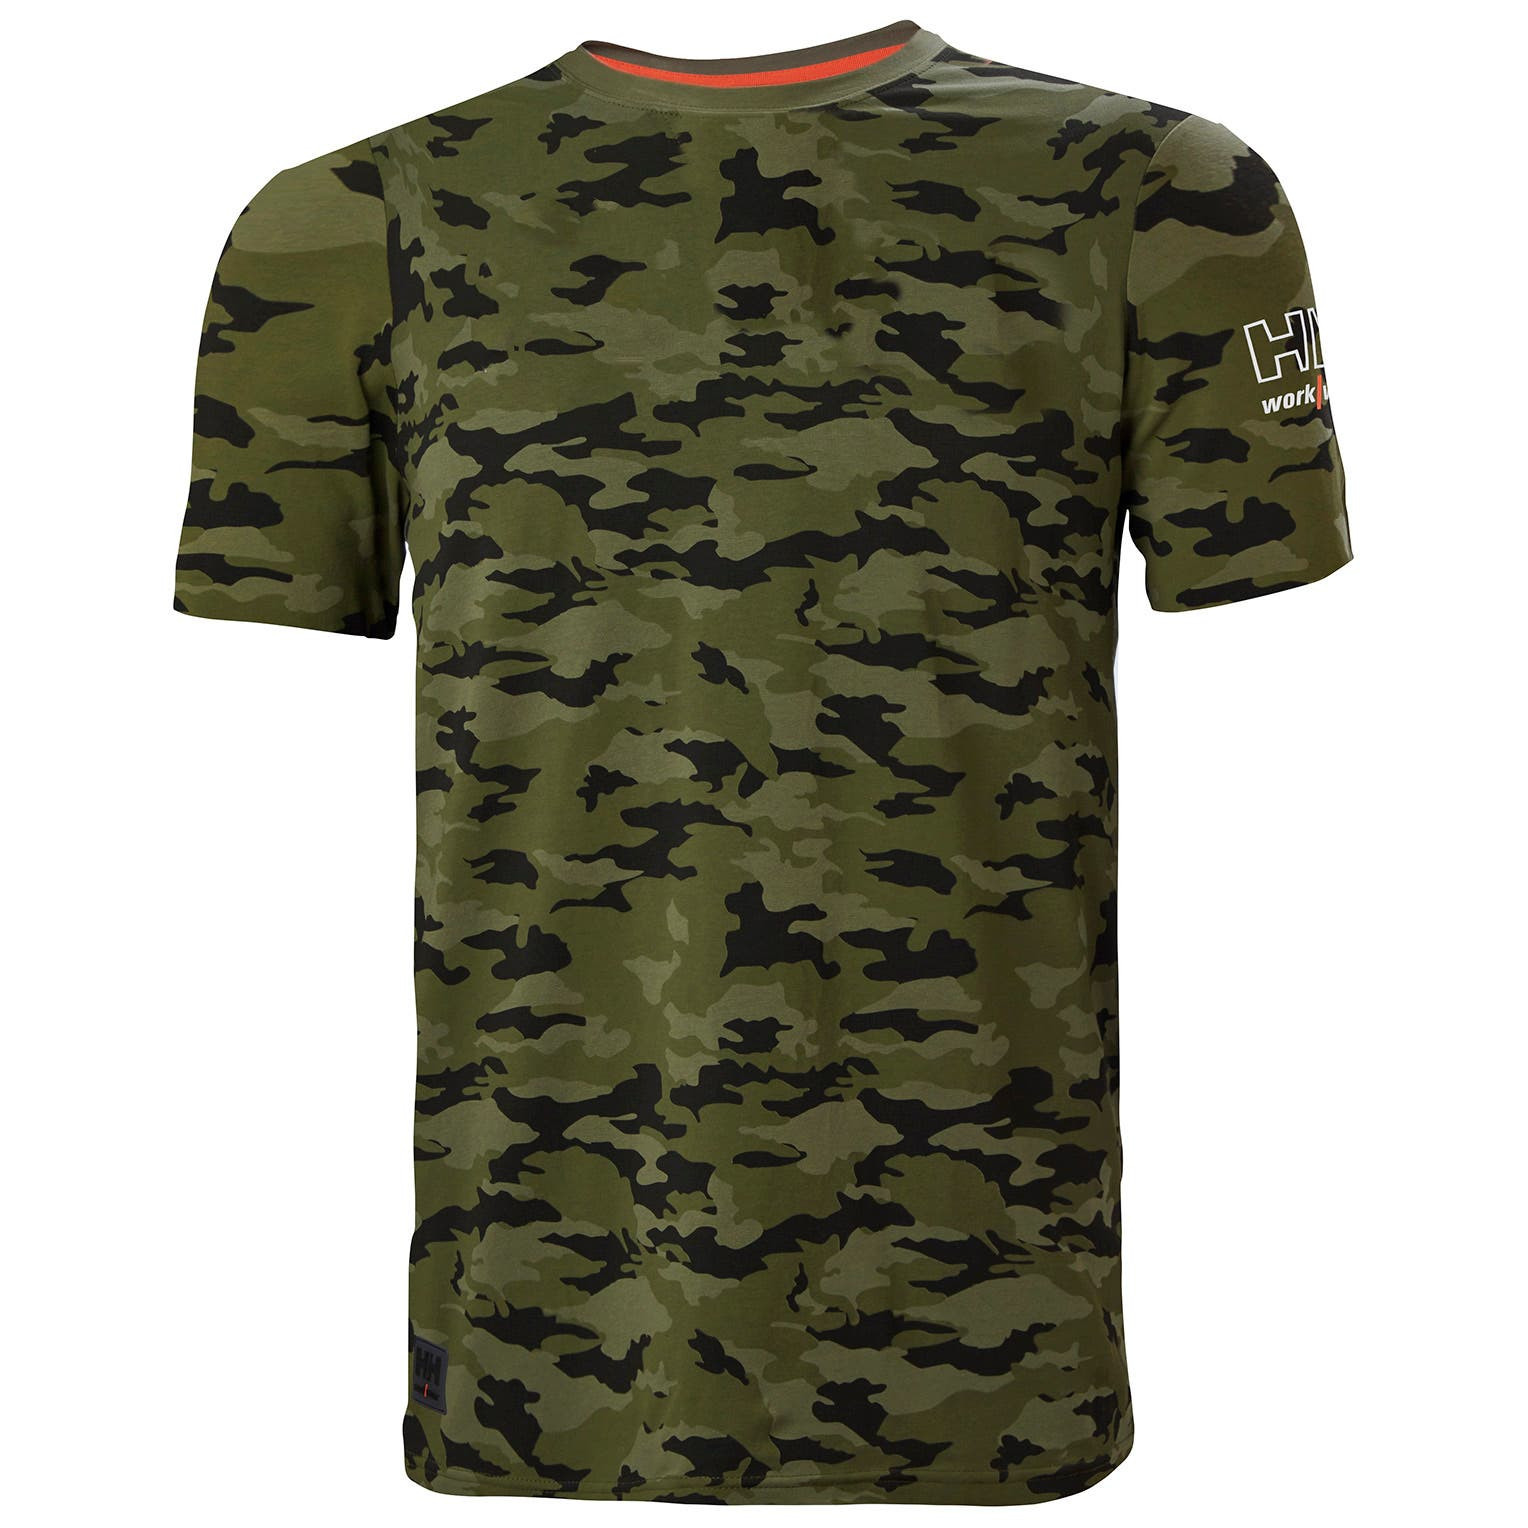 Футболка Helly Hansen Kensington T-Shirt - 79246 (Camo)